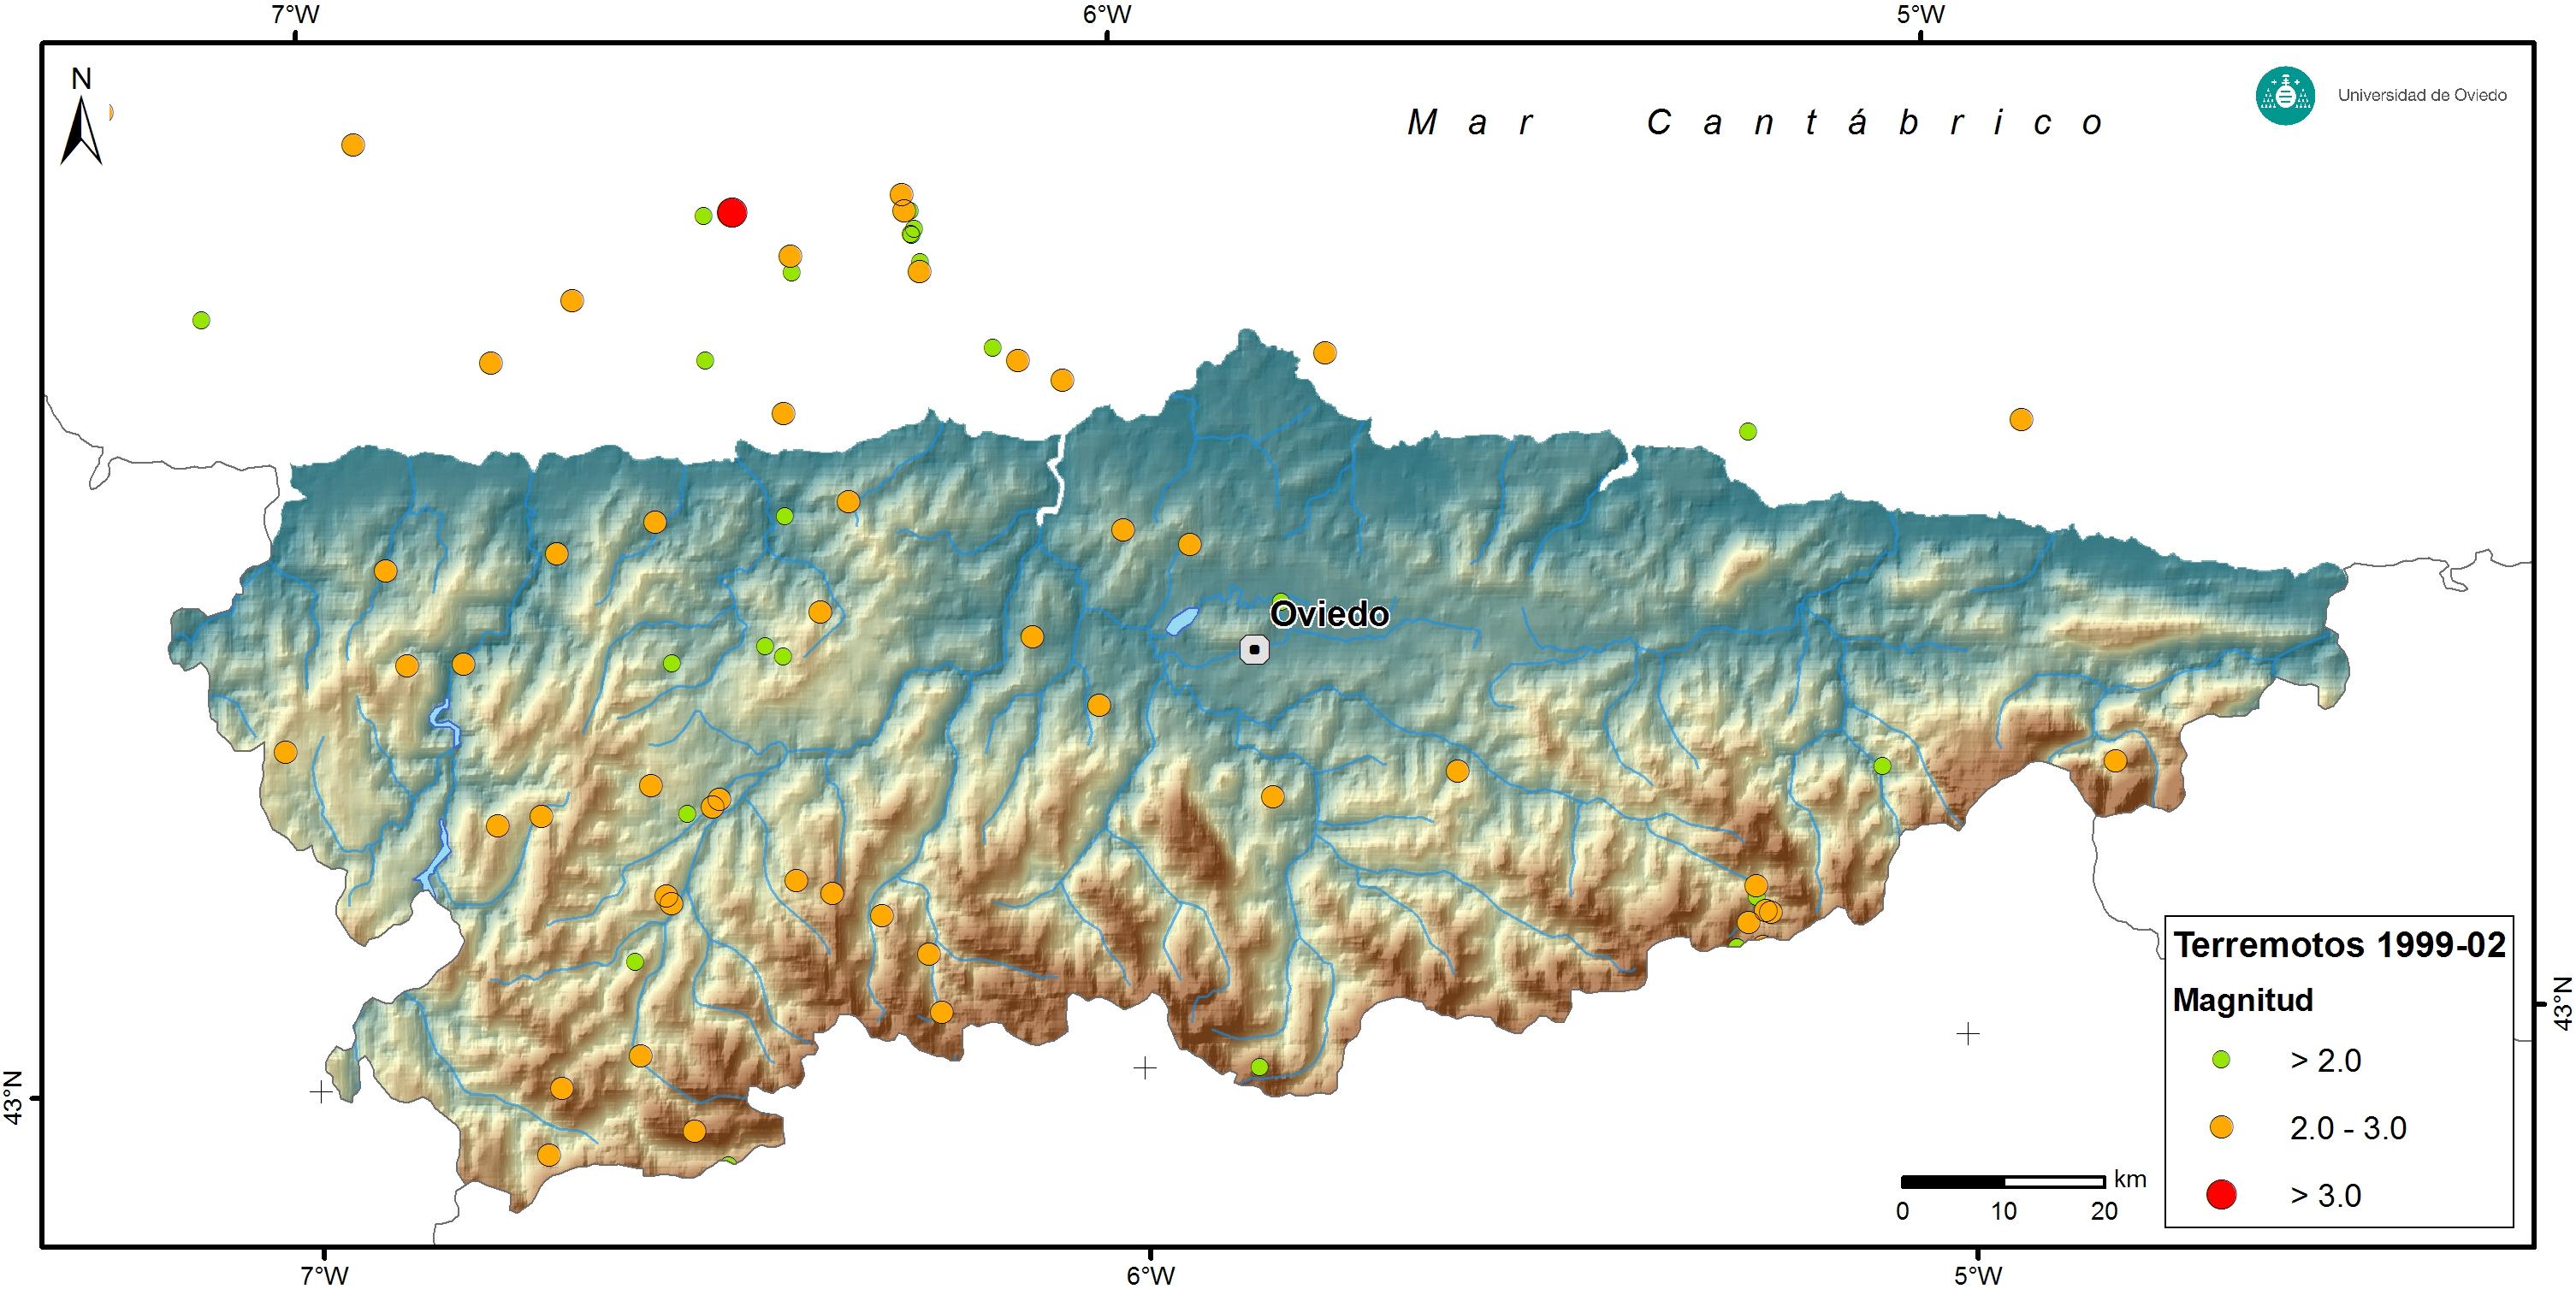 Asturias Seismicity Map